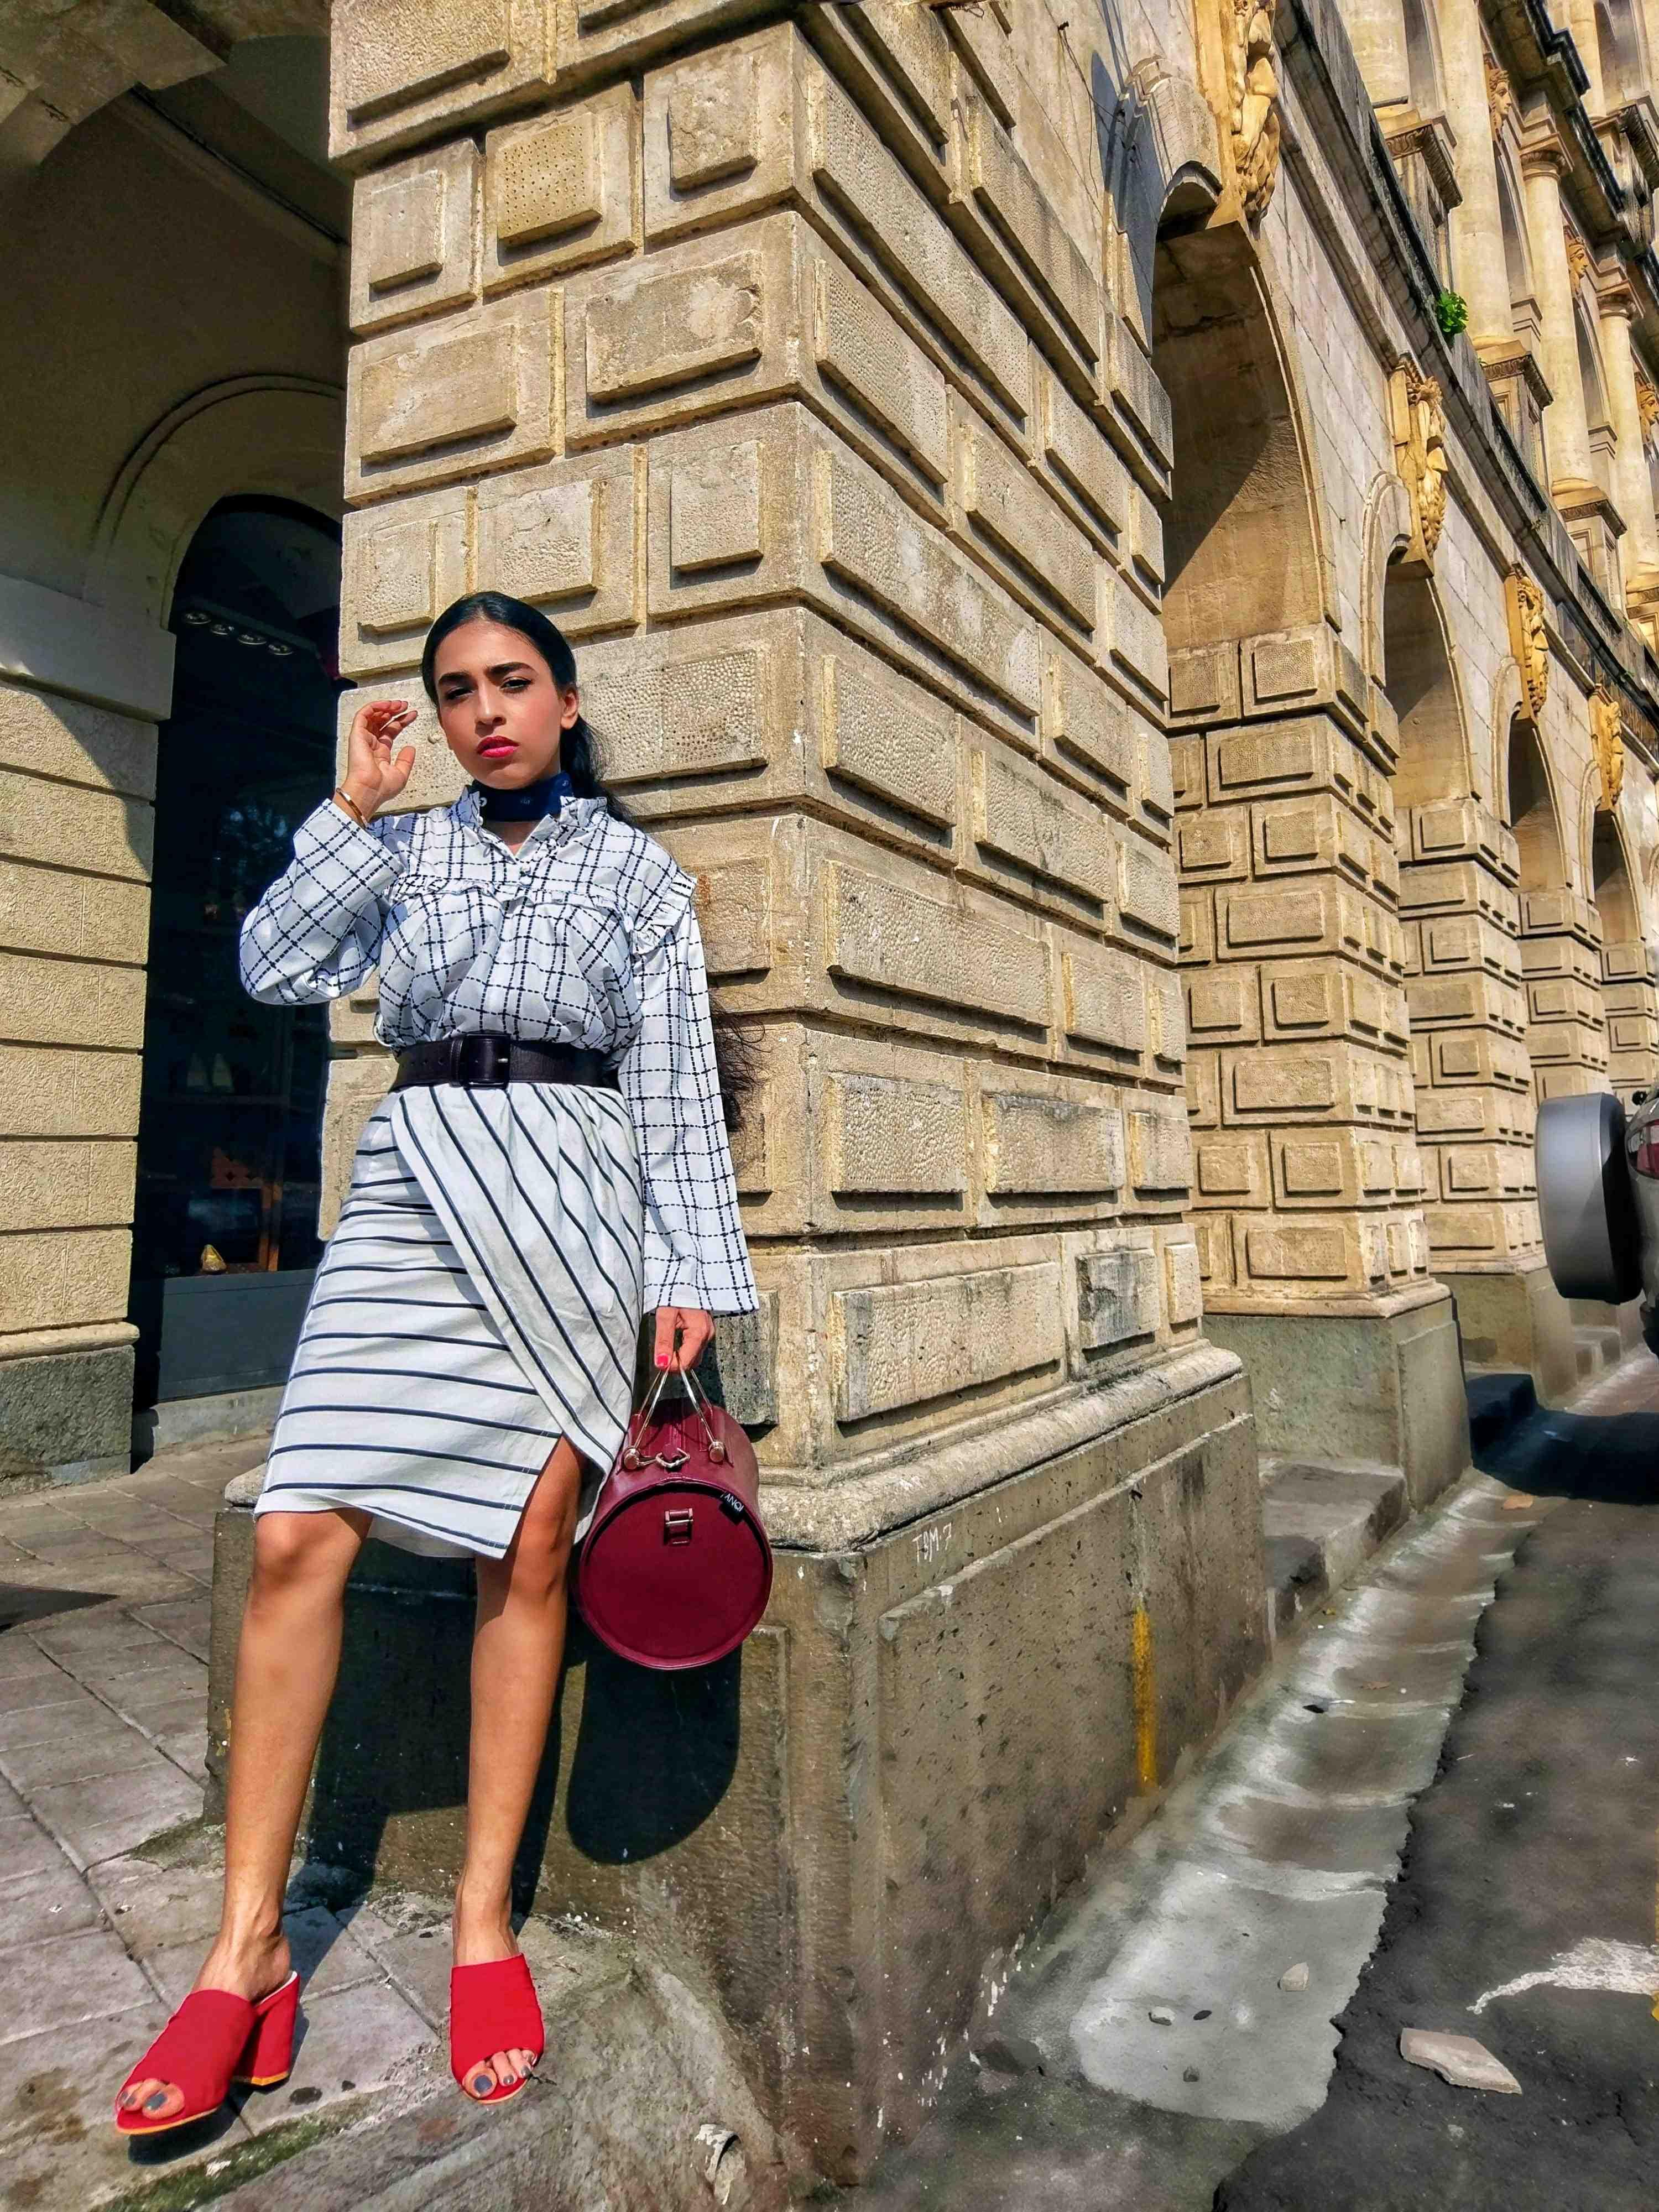 white shirt, checkered shirt, ruffled shirt, striped skirt, monochrome style, stripes checks, black and white style, street style, india fashion week